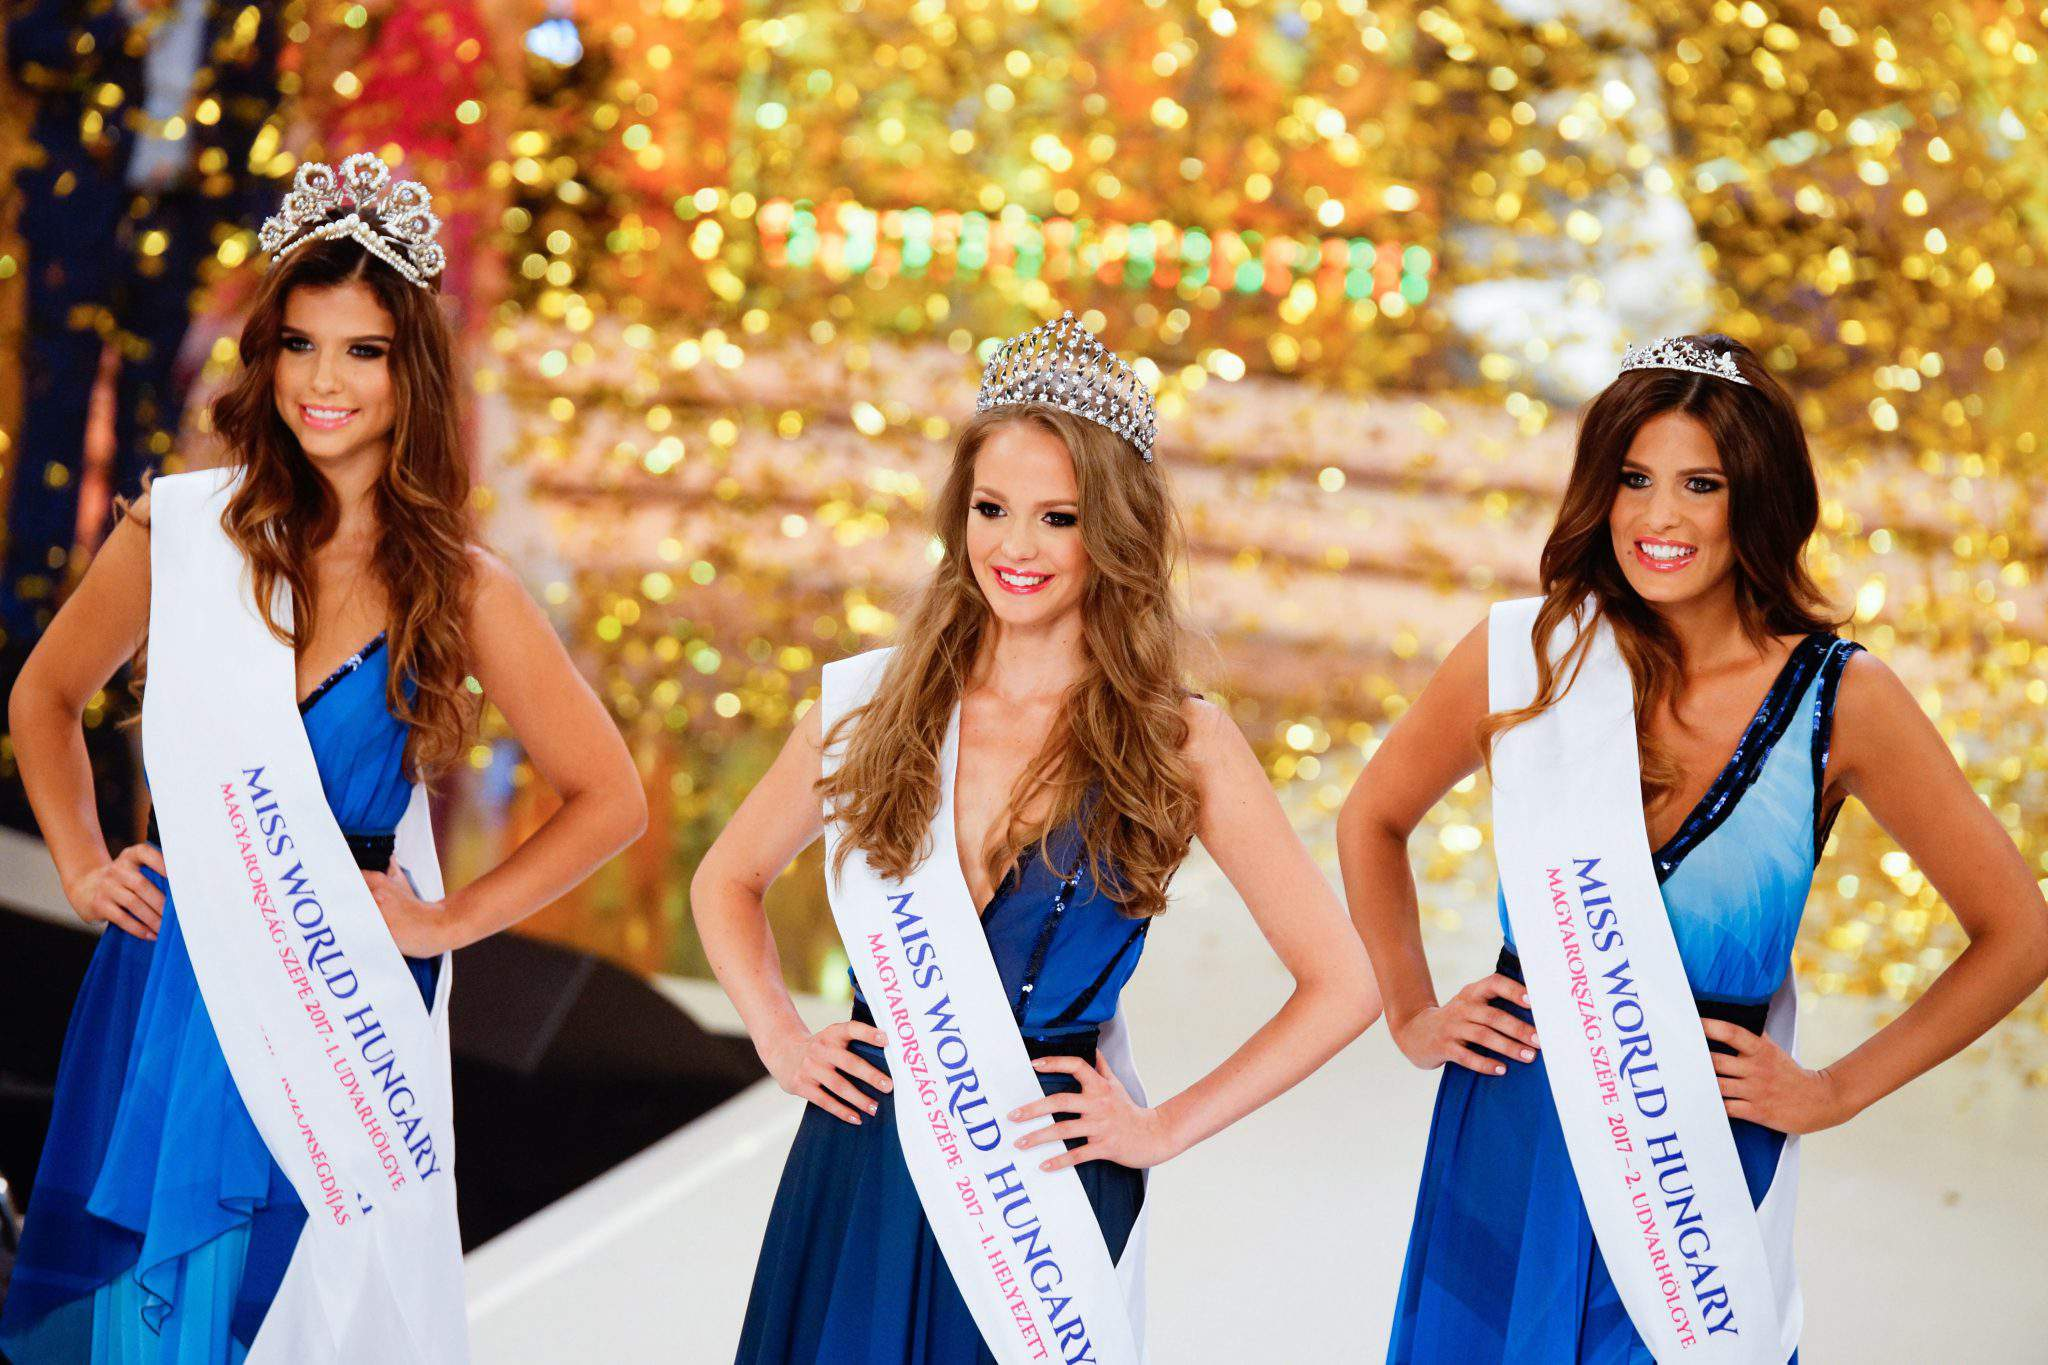 Miss World Hungary 2017